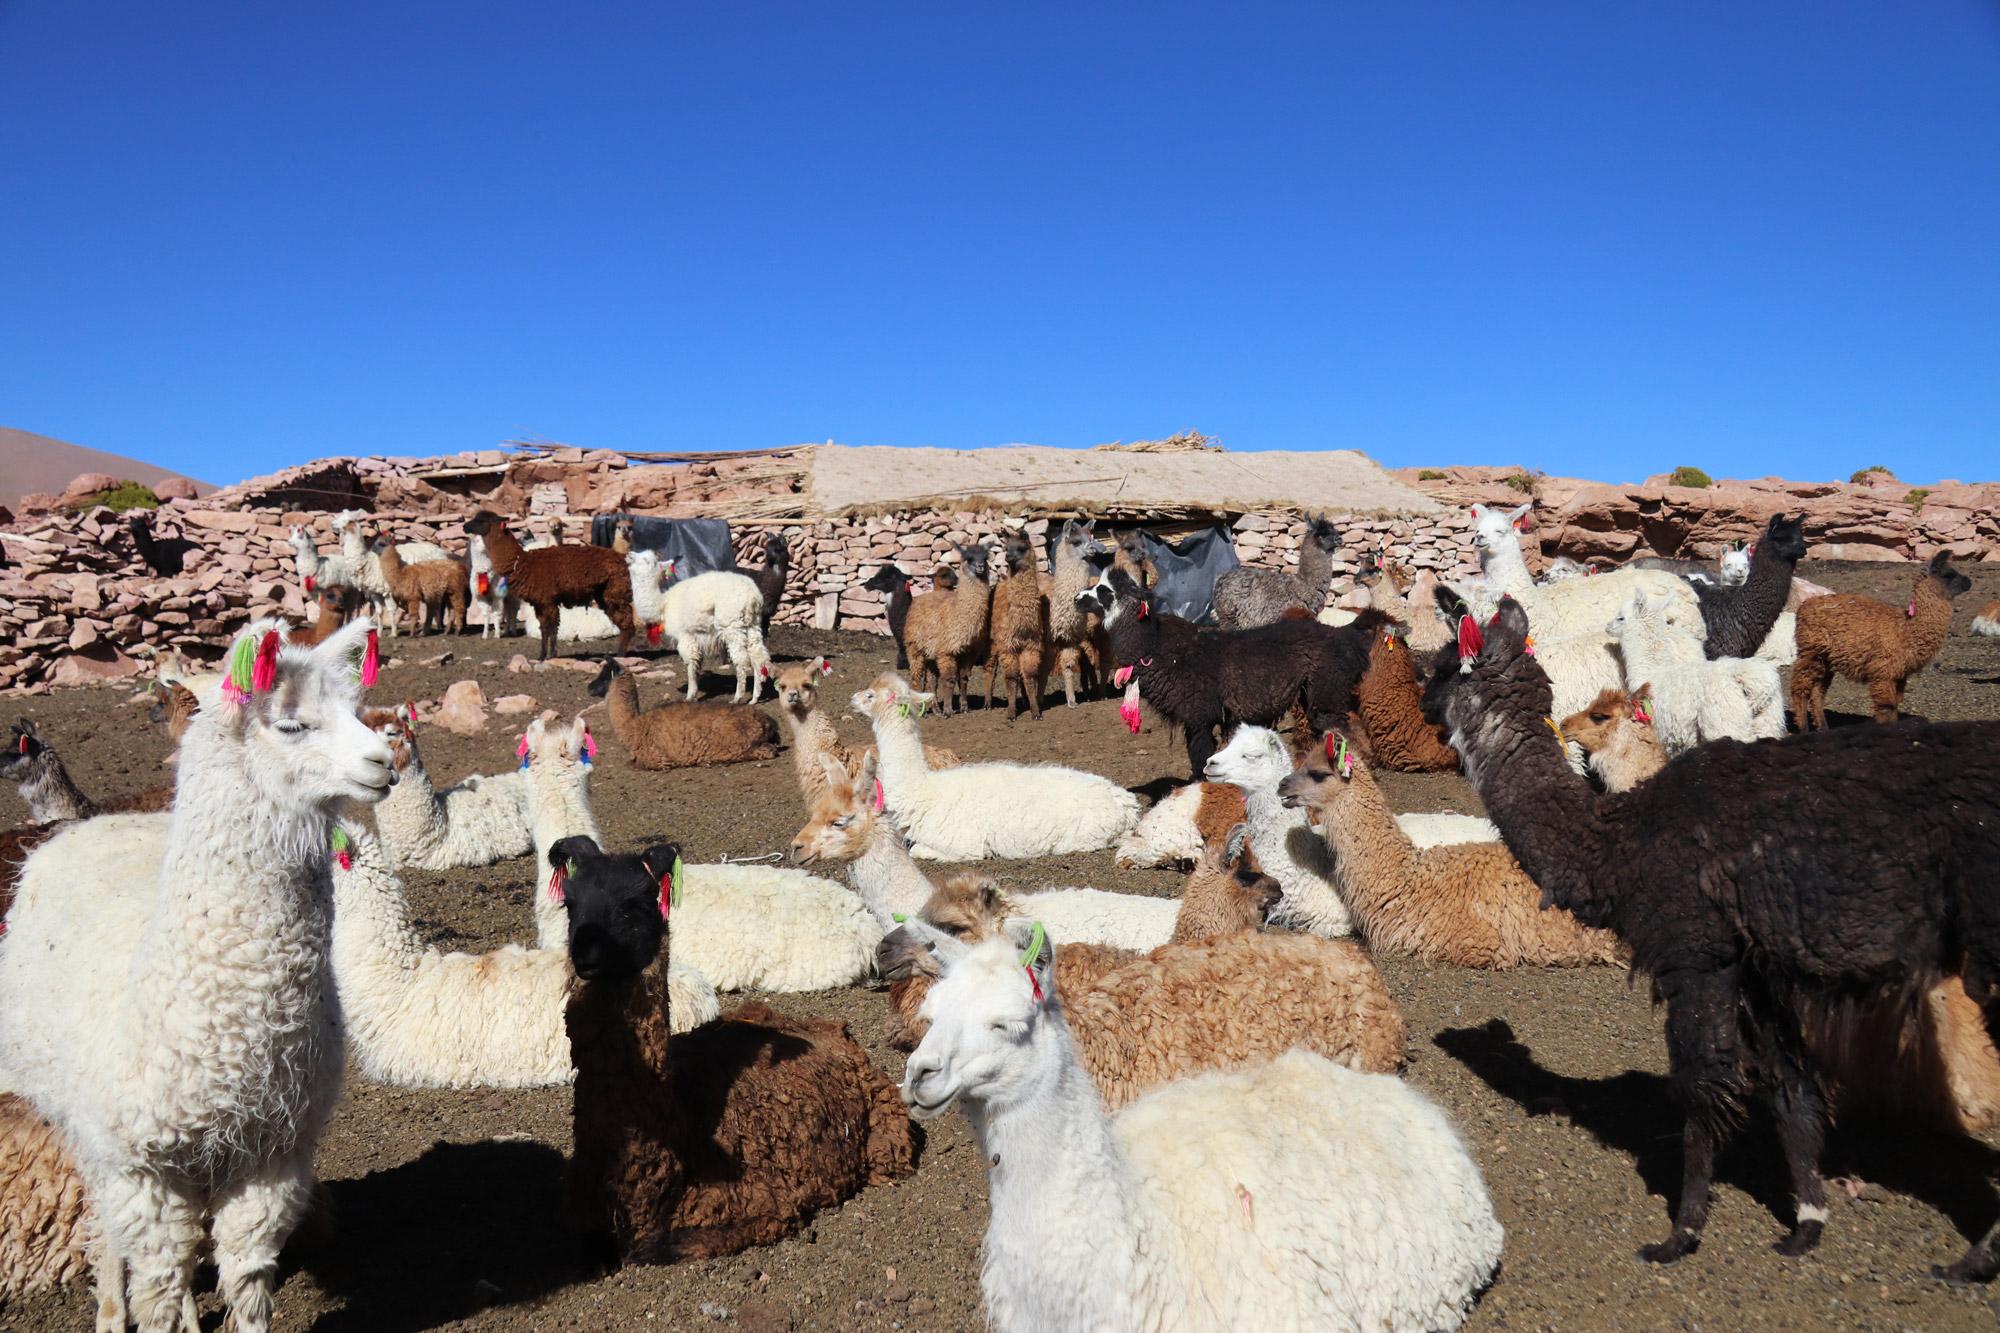 Reisverslag Bolivia: Four Days Of Fantasy Tour - Lamaboerderij in Quetana Grance